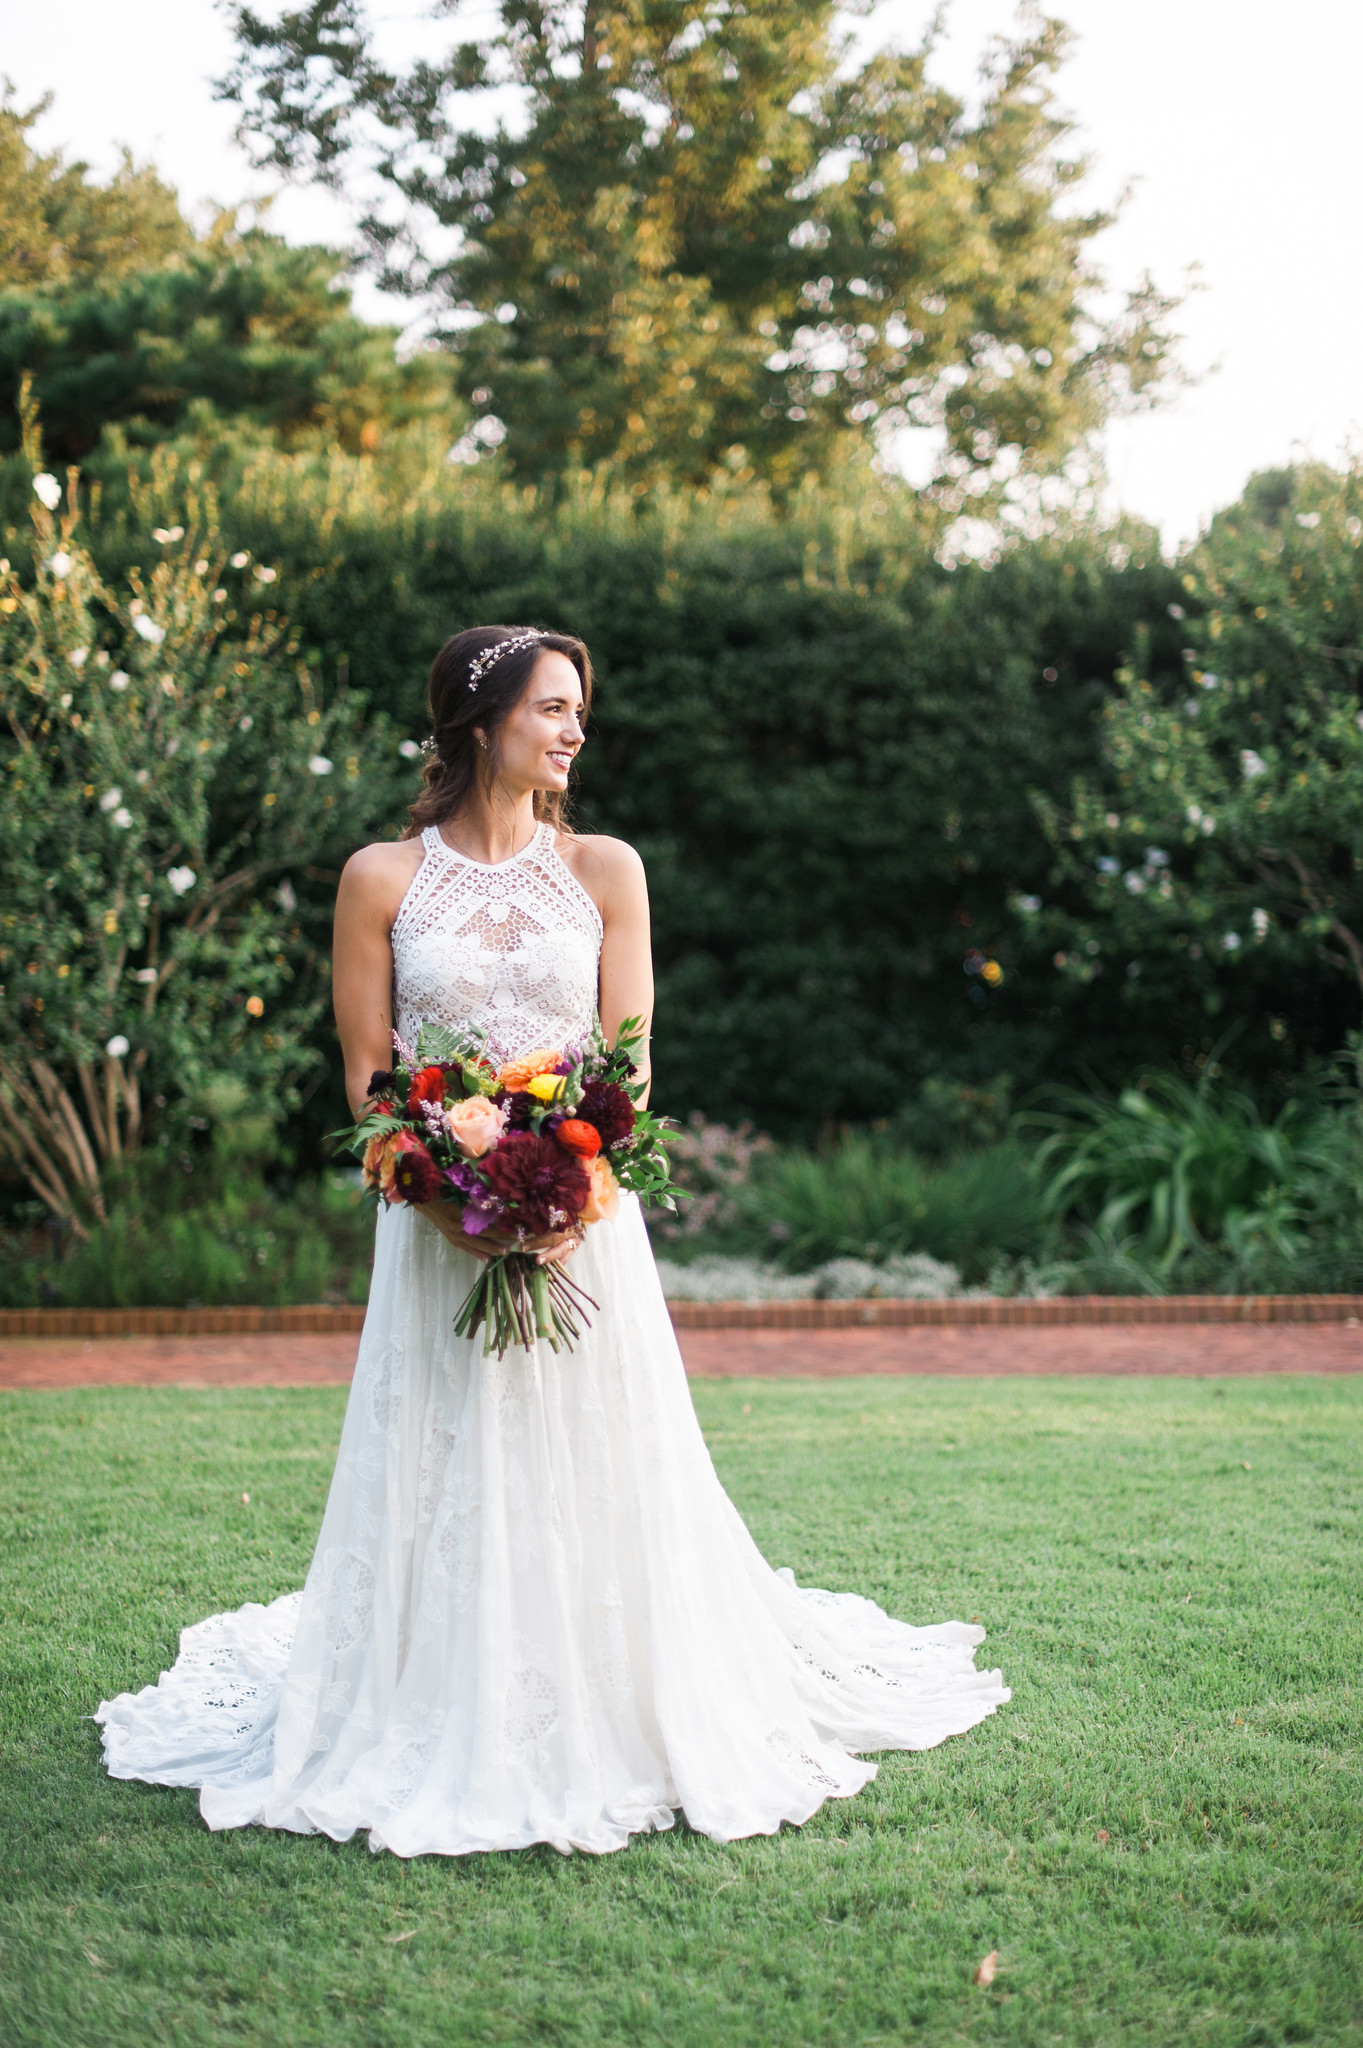 thomas-wedding-075-X4.jpg